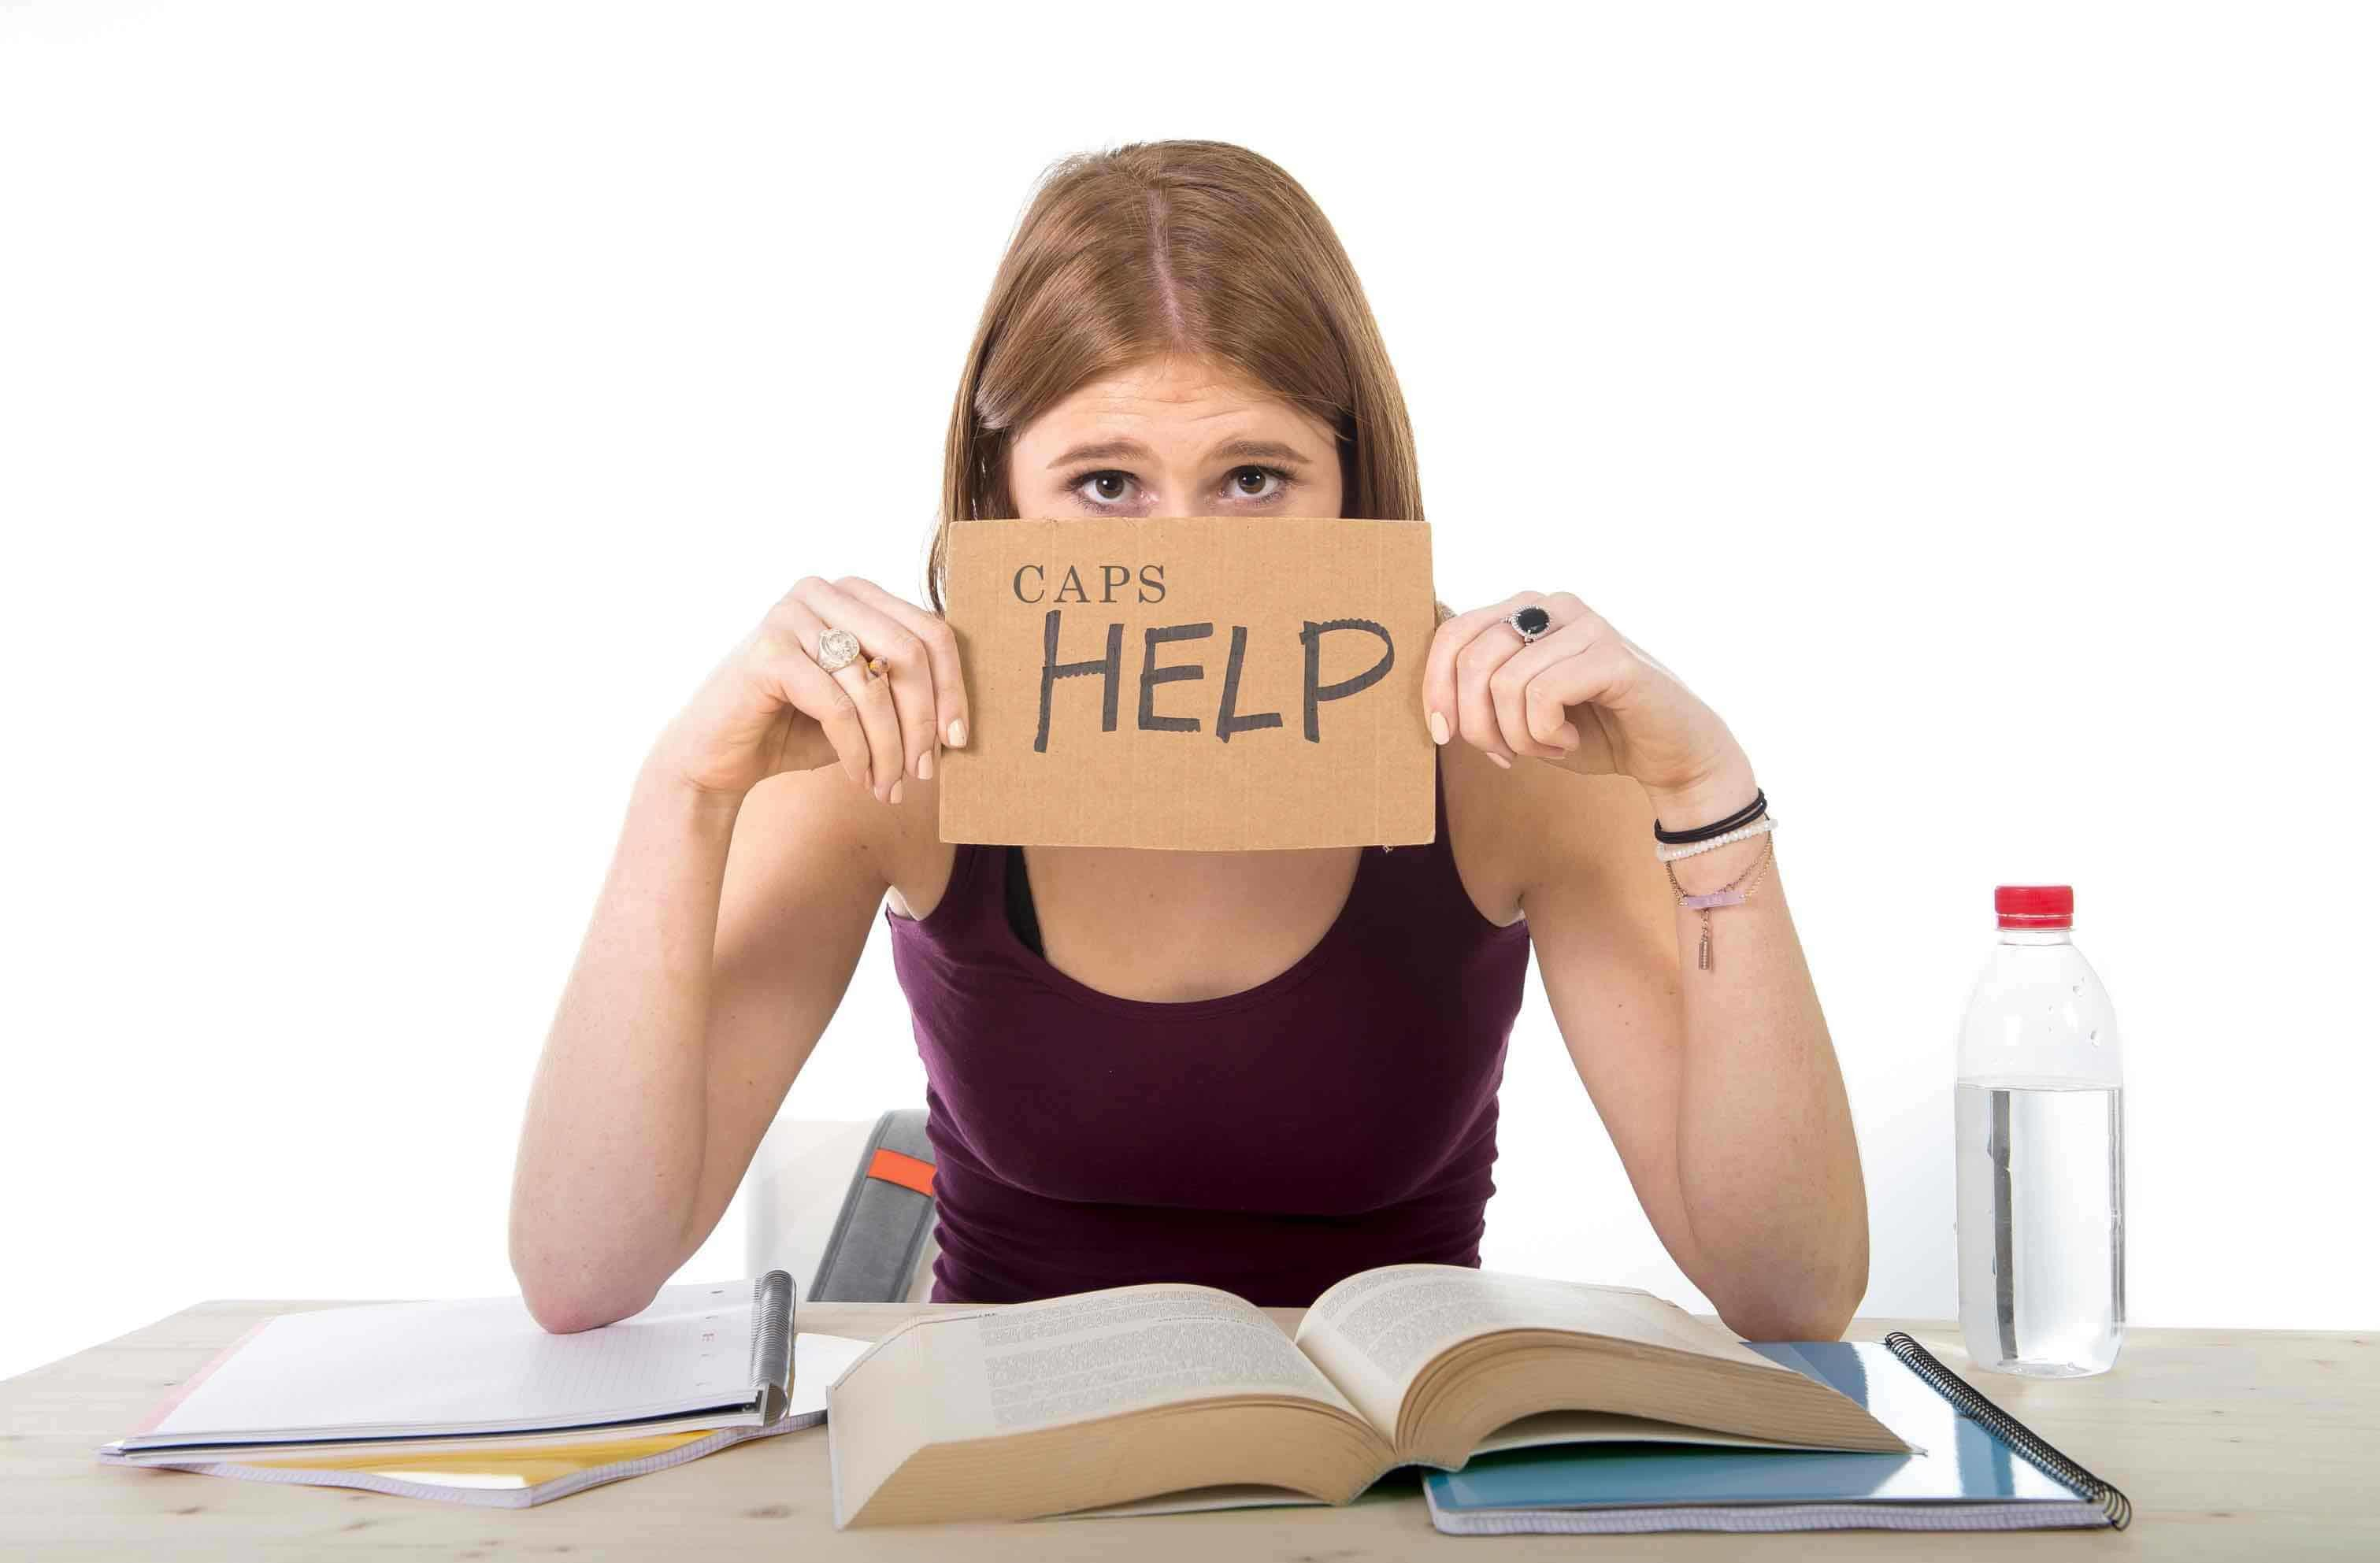 CAPS exam November eksamens